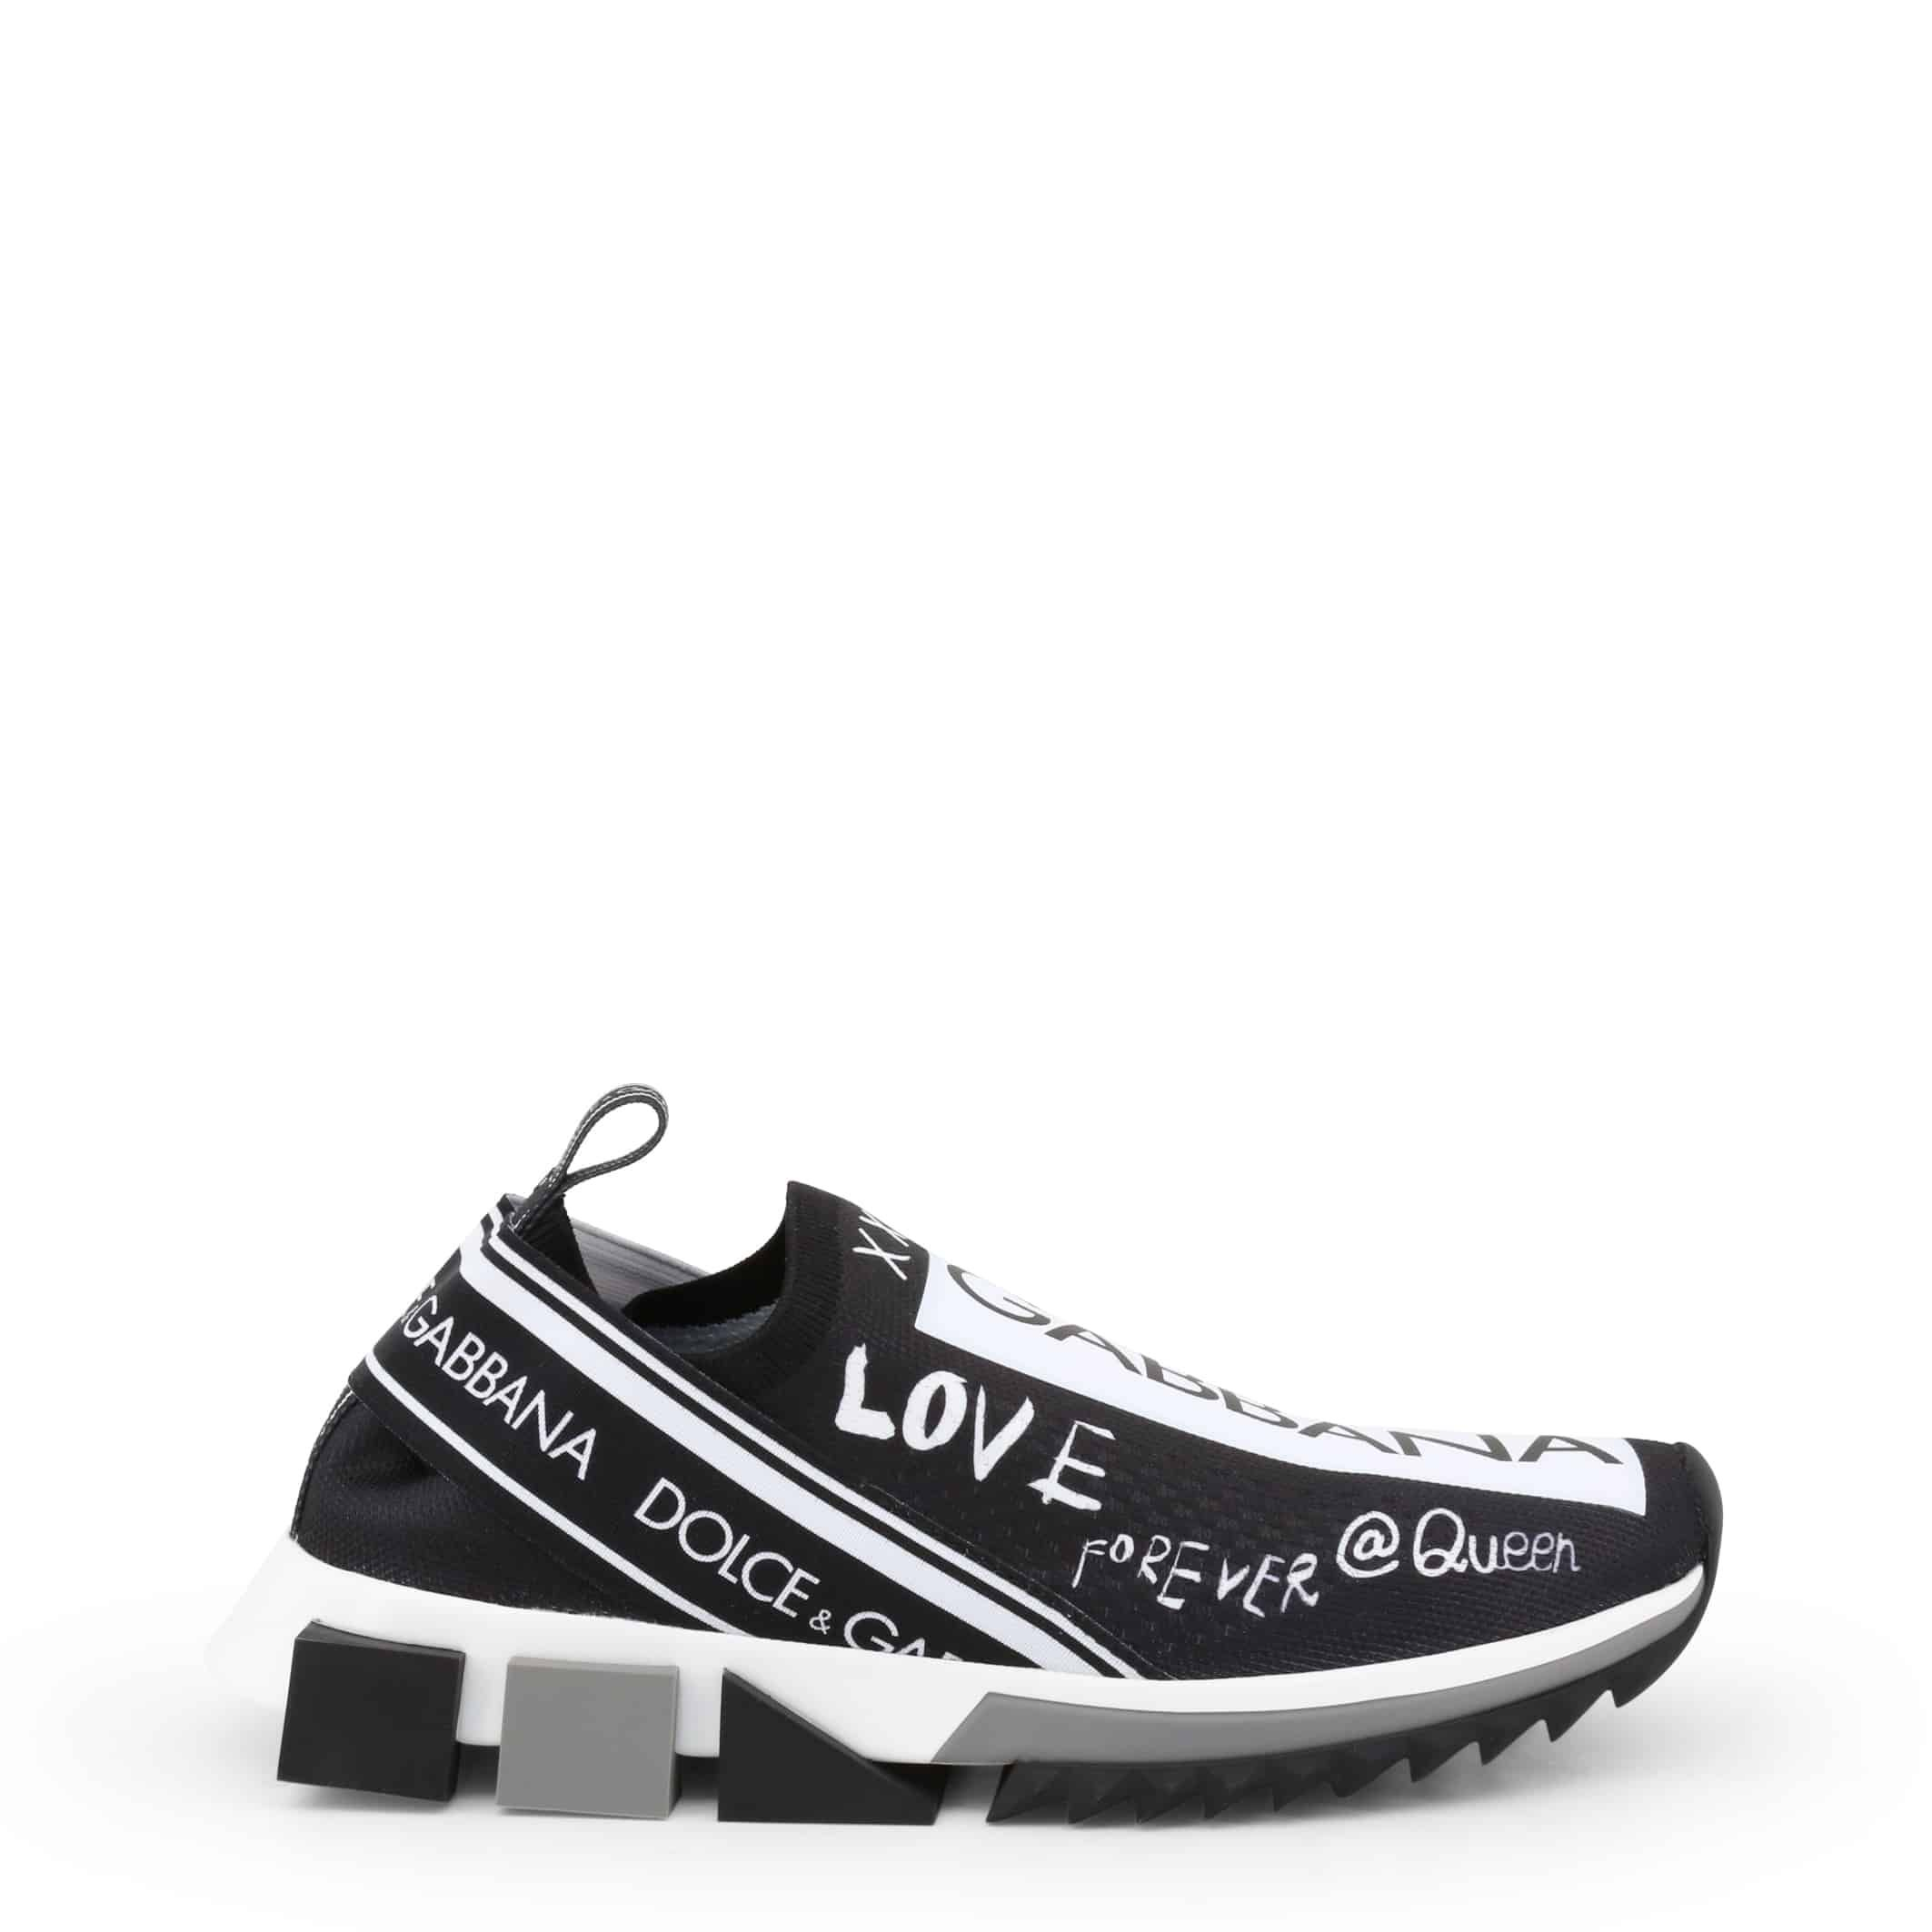 Chaussures Dolce & Gabbana – CK1595_AV005